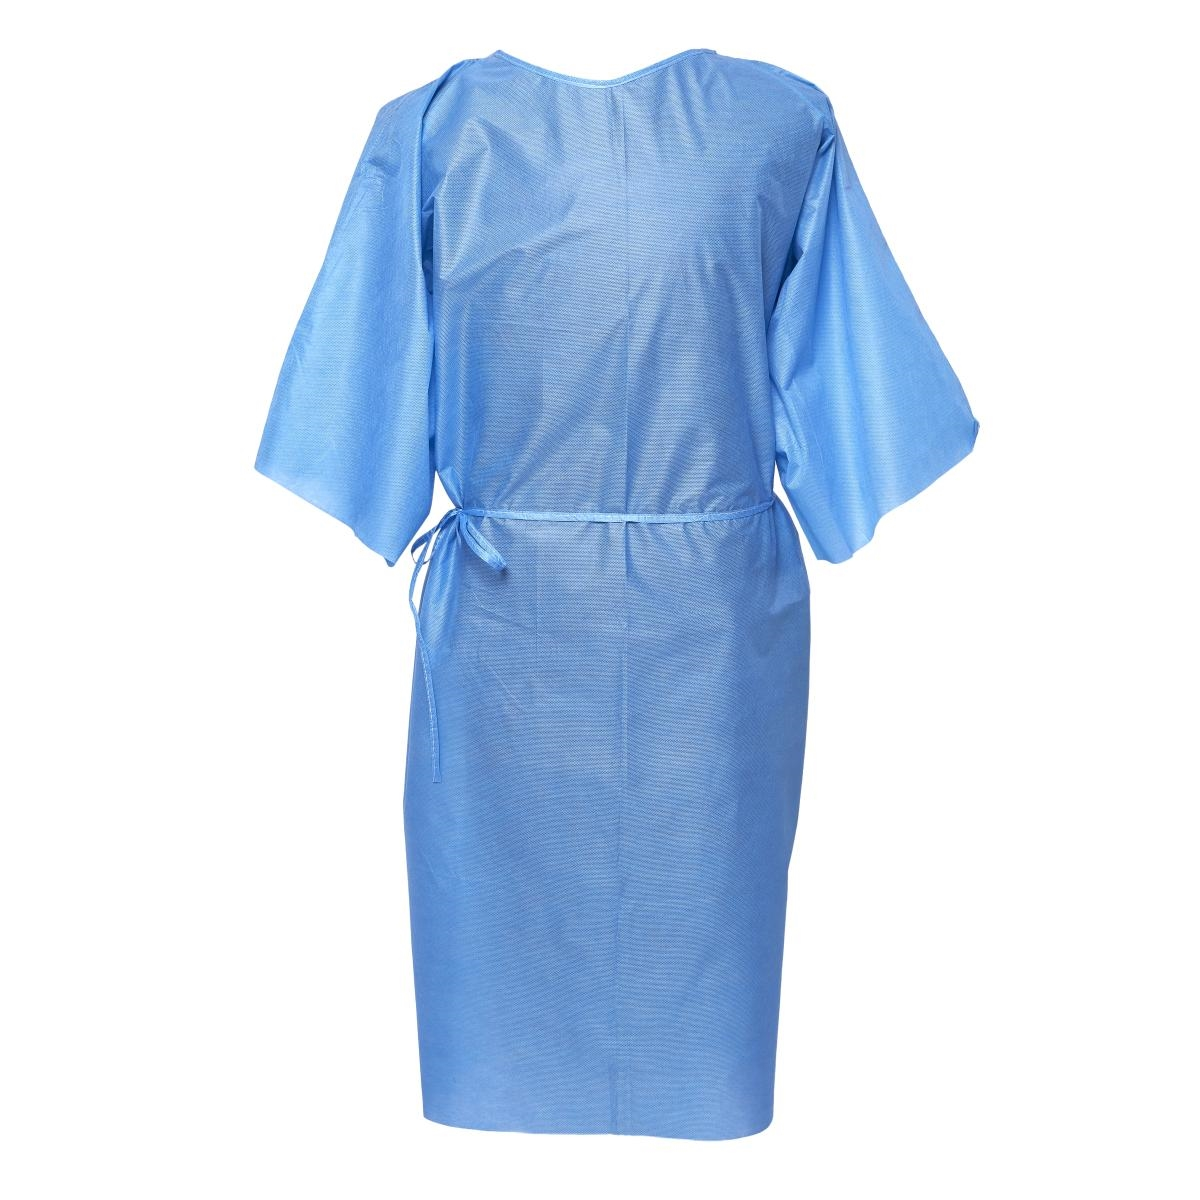 NON27146SLXL Disposable Multi Layer Patient Gowns